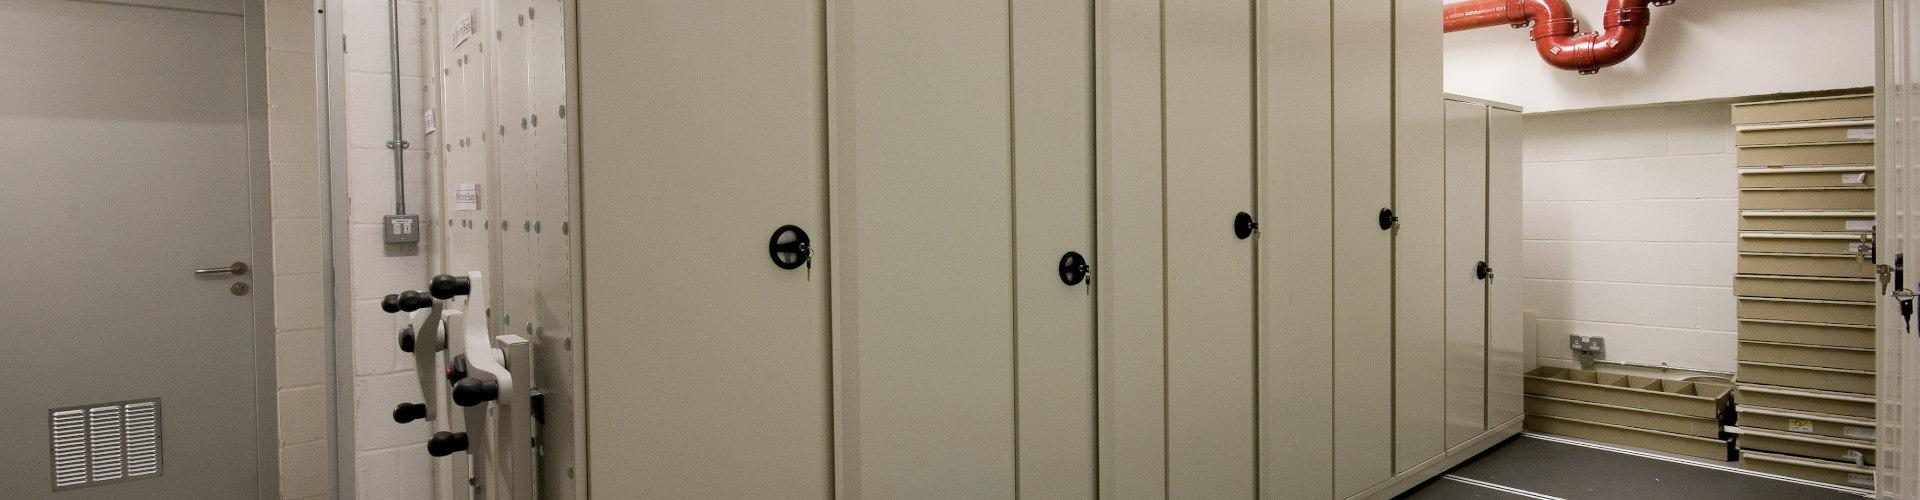 Secure Label Storage